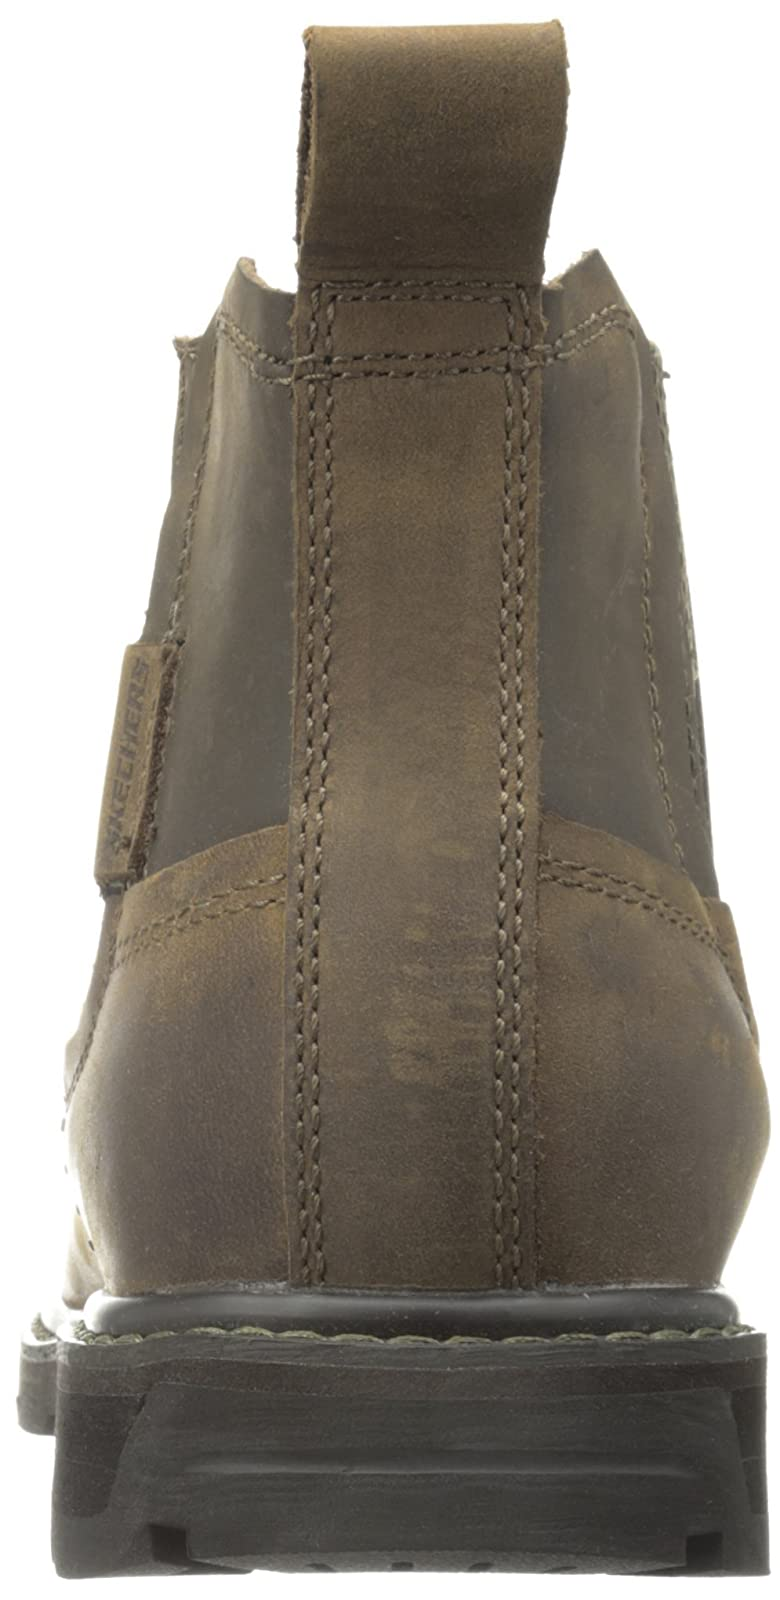 Skechers USA Men's Blaine Orsen Ankle Boot Dark Brown - 2